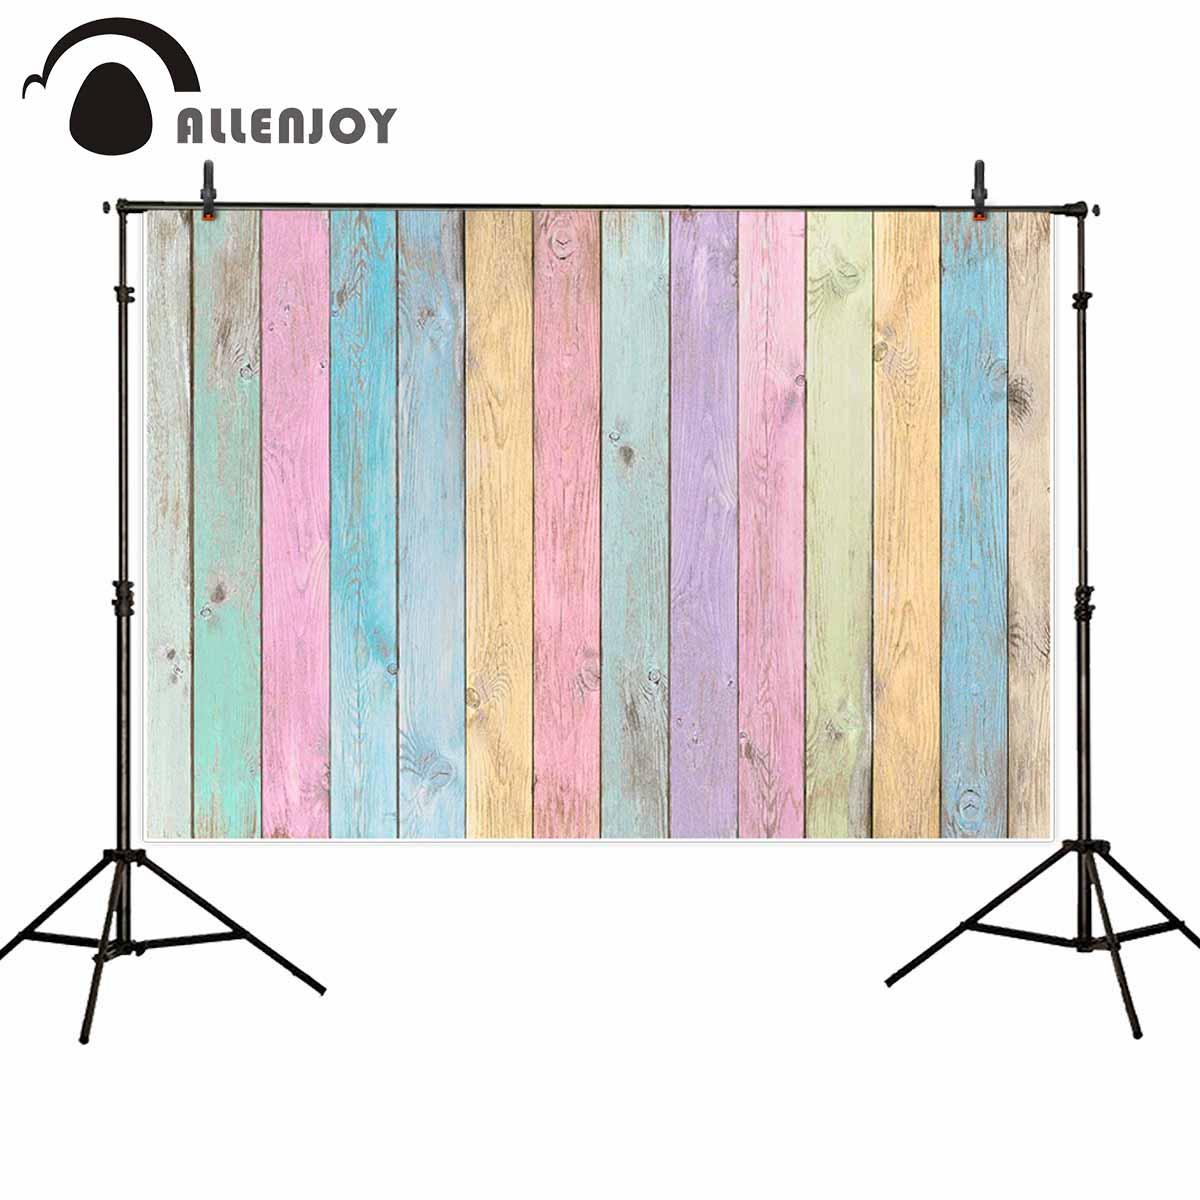 Allenjoy thin vinyl cloth newborn photography wood pastel vintage fence grunge natural texture aged backdrop for photo studio